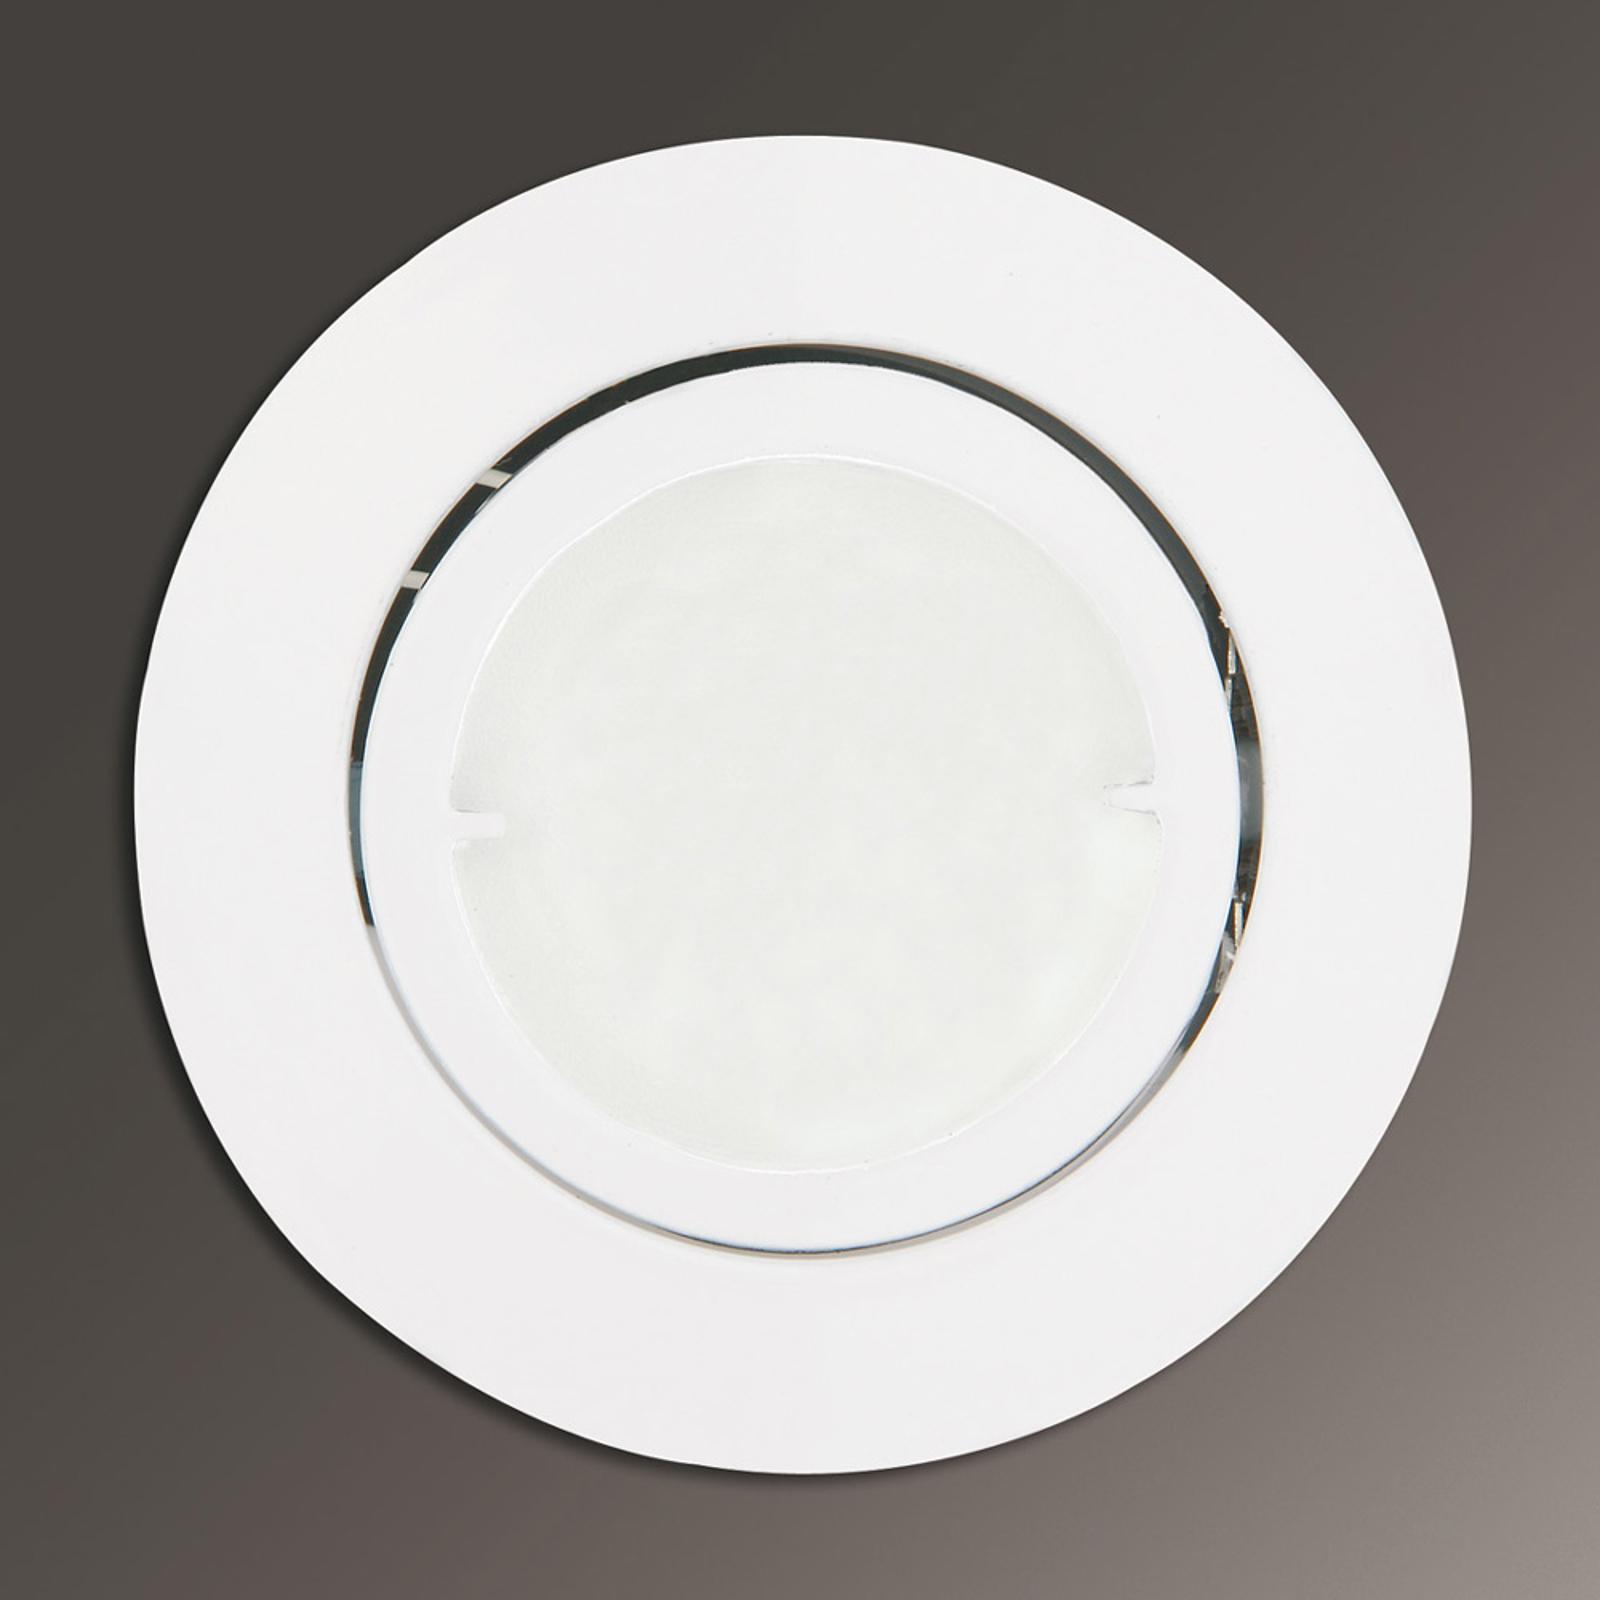 Joanie - LED-inbyggnadslampa i vitt, rund